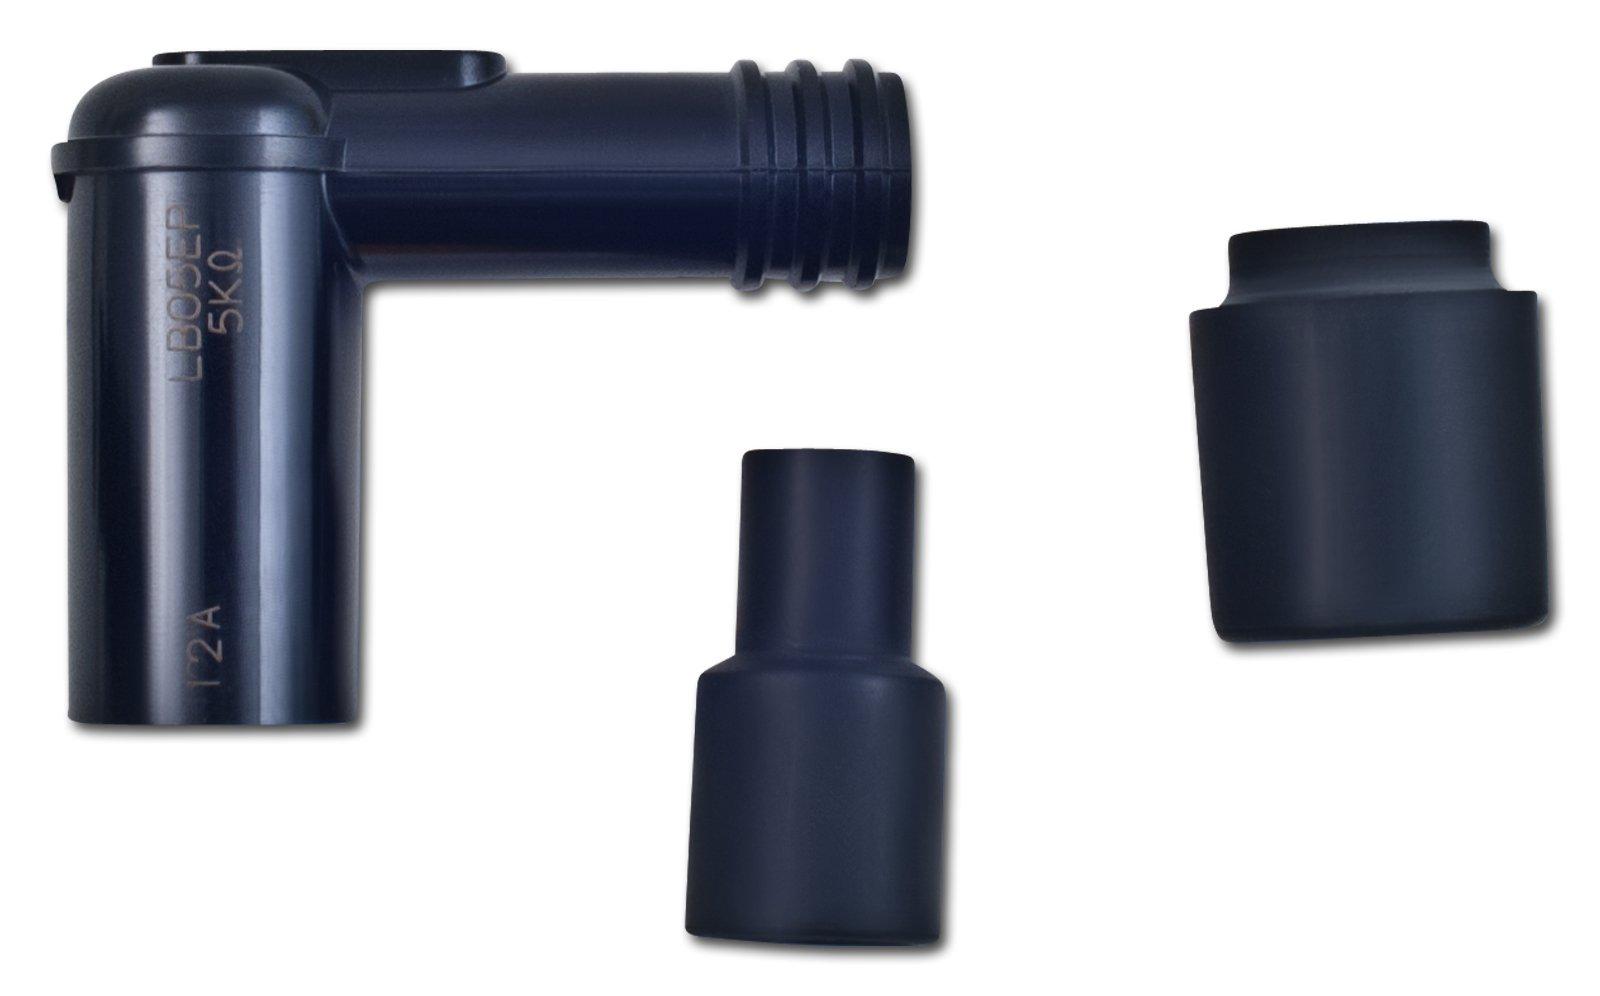 Arnold-3121-N2-0107-Zndkerzenstecker-universal-hoch-fr-Rasenmher-Rasentraktoren